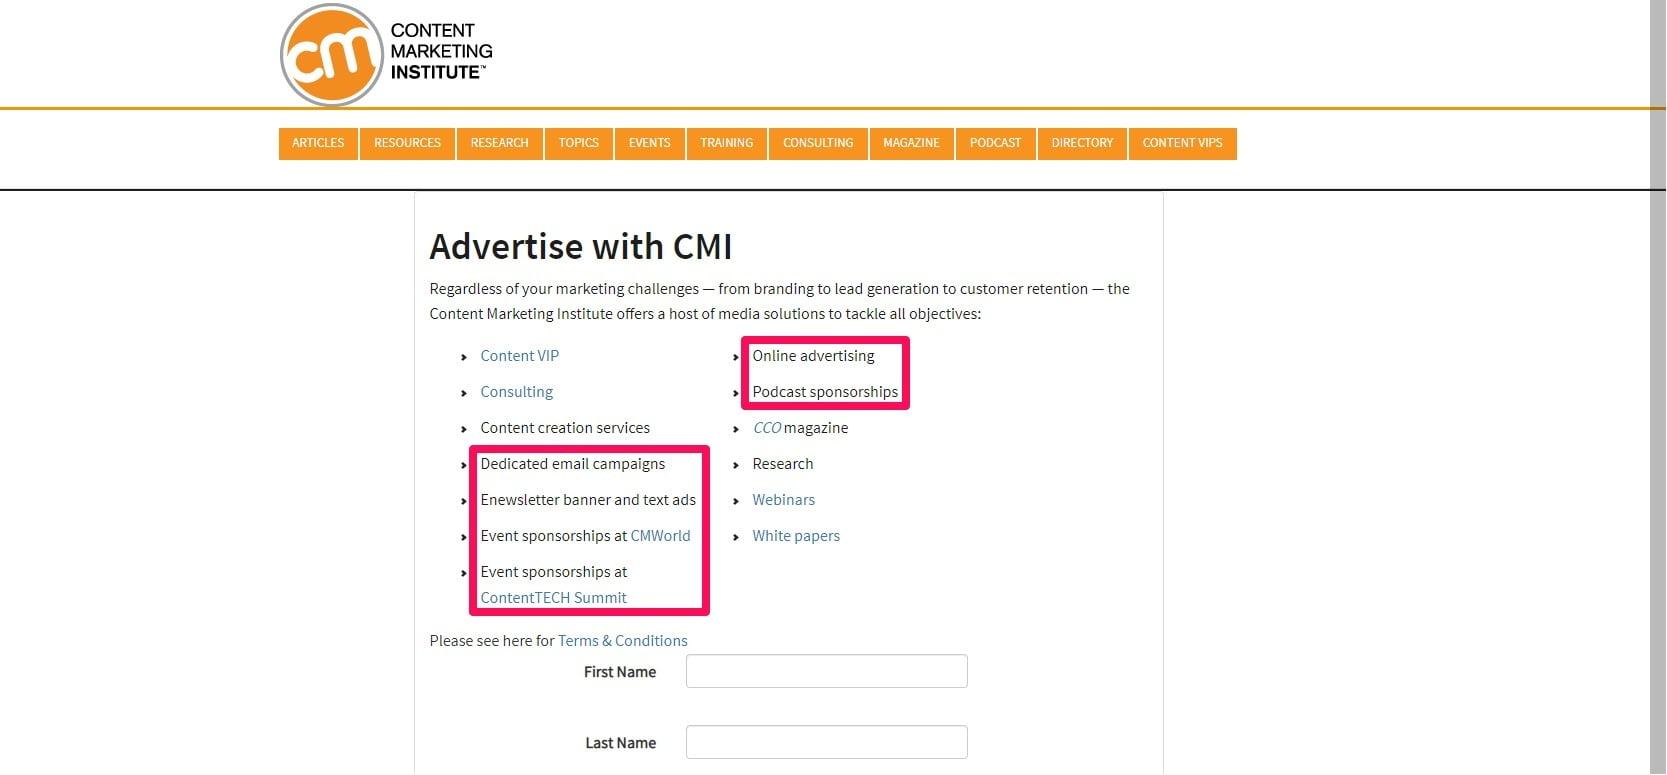 CMI advertising